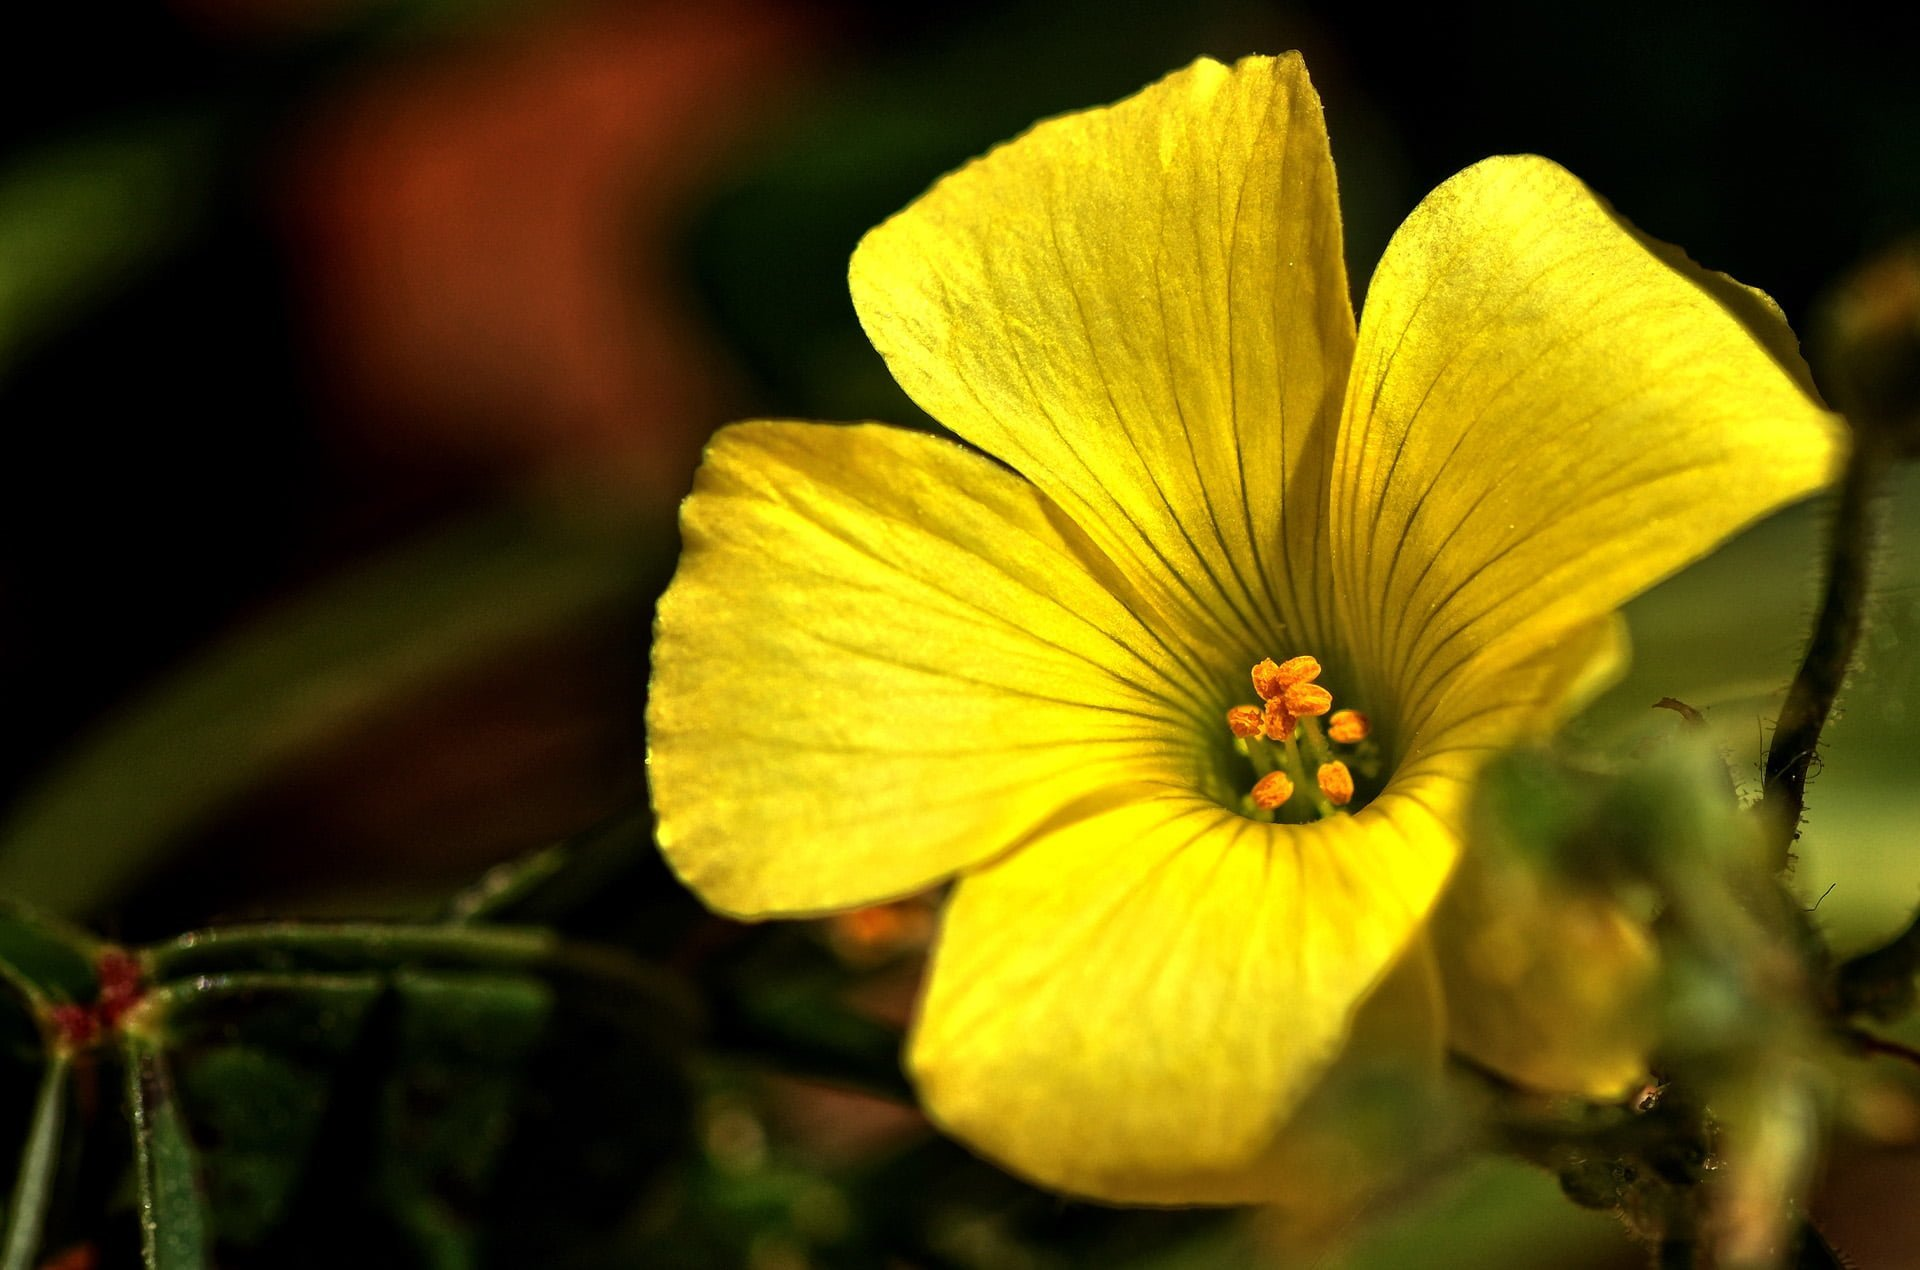 sarı yonca